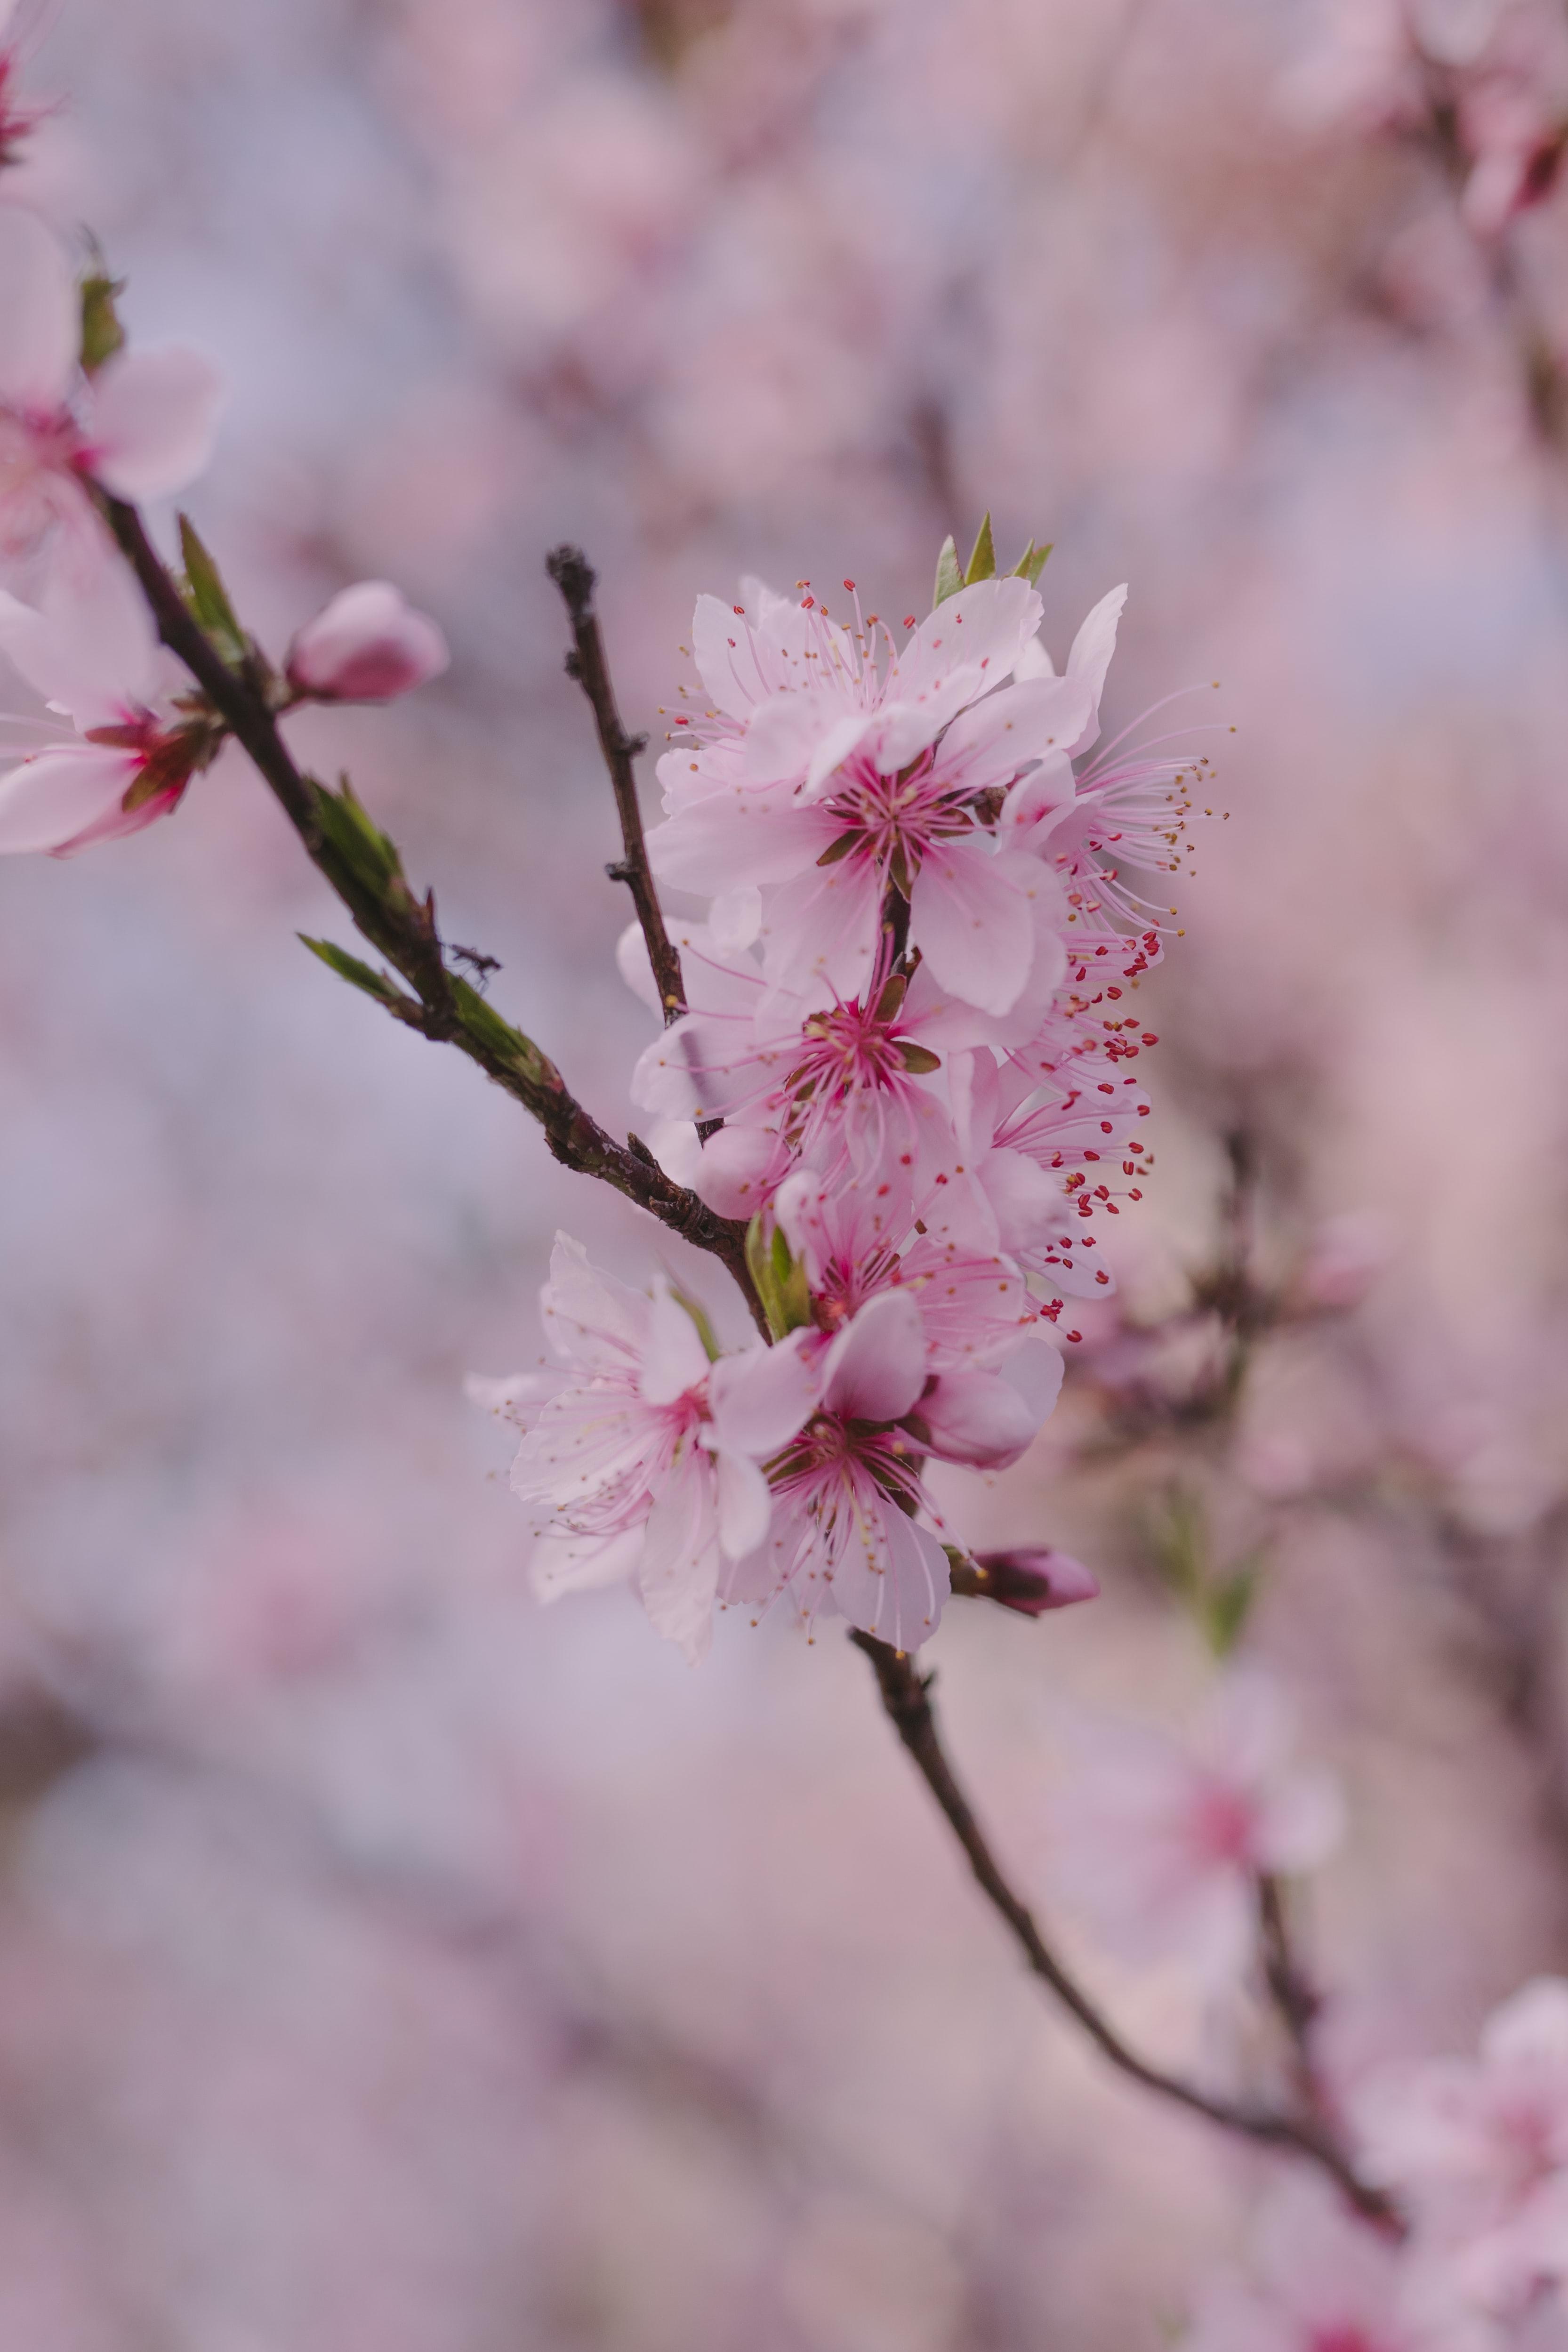 55475 Screensavers and Wallpapers Sakura for phone. Download Flowers, Pink, Sakura, Macro, Petals, Branch, Spring pictures for free